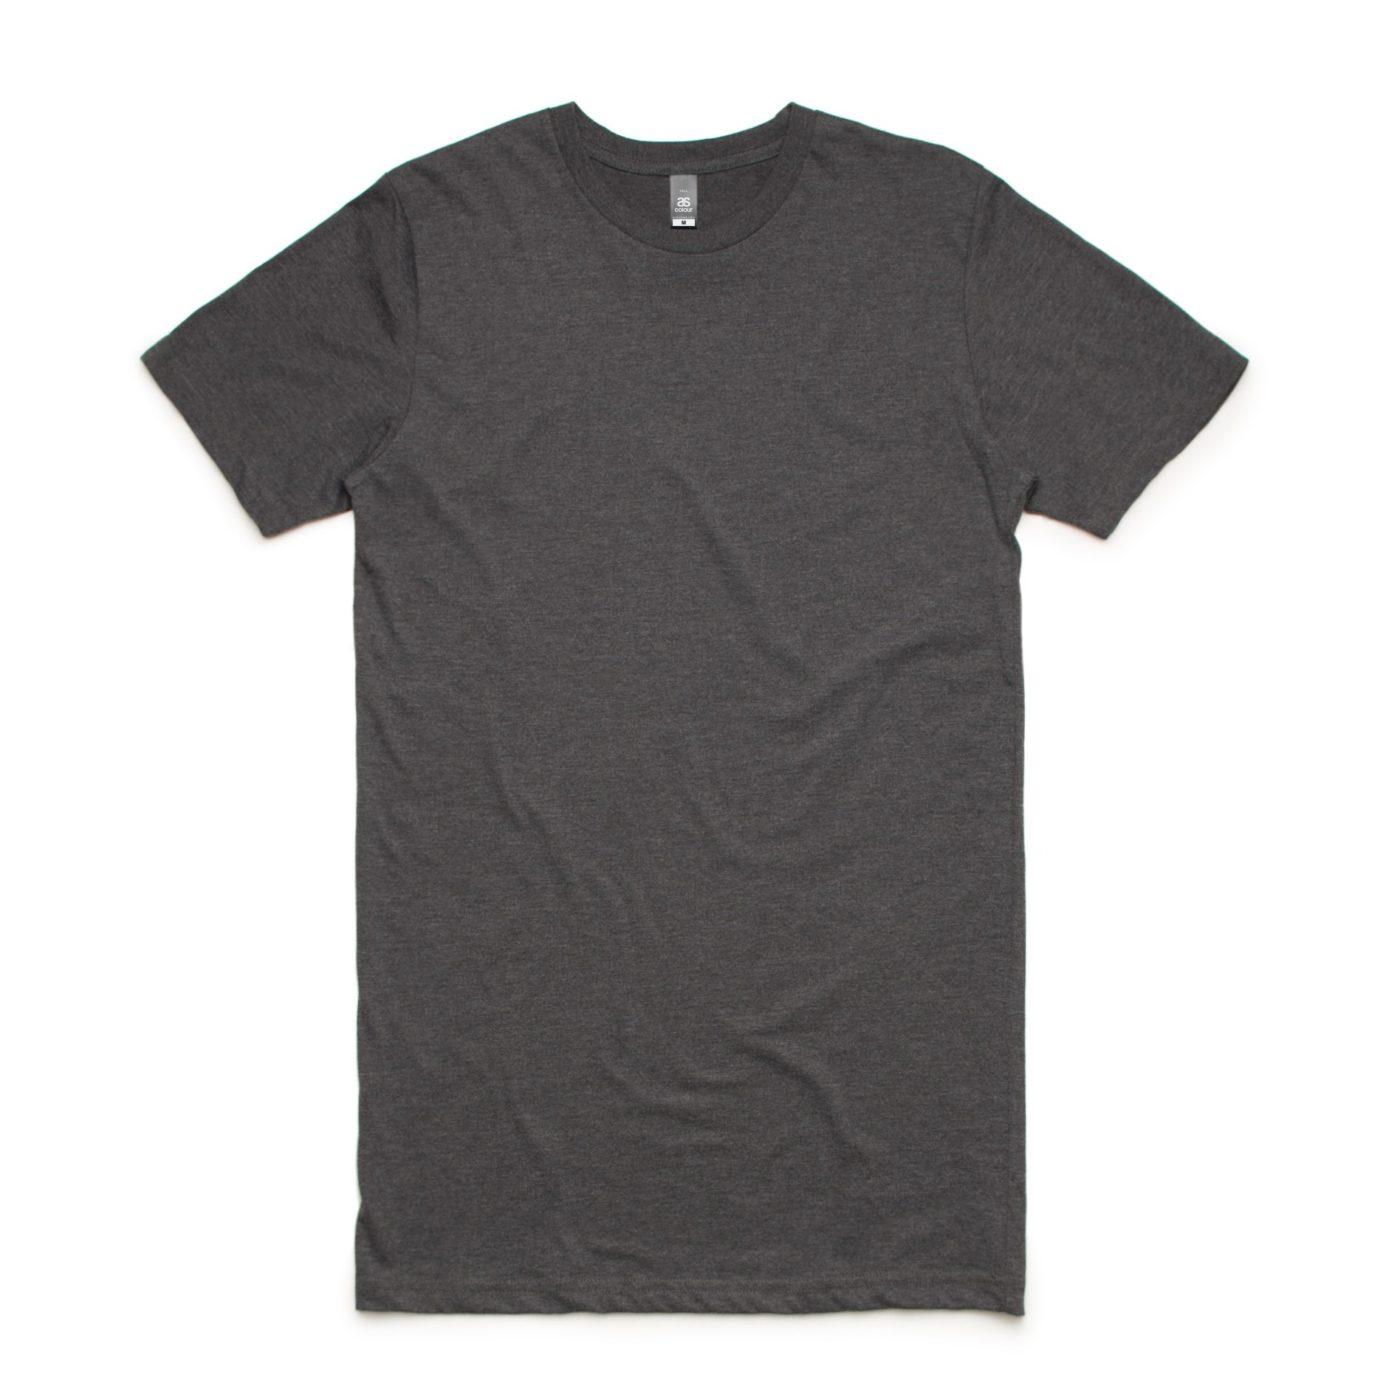 Asphalt Marl AS Colour AS5013 Tall Tee longer length tee great to print or embroider